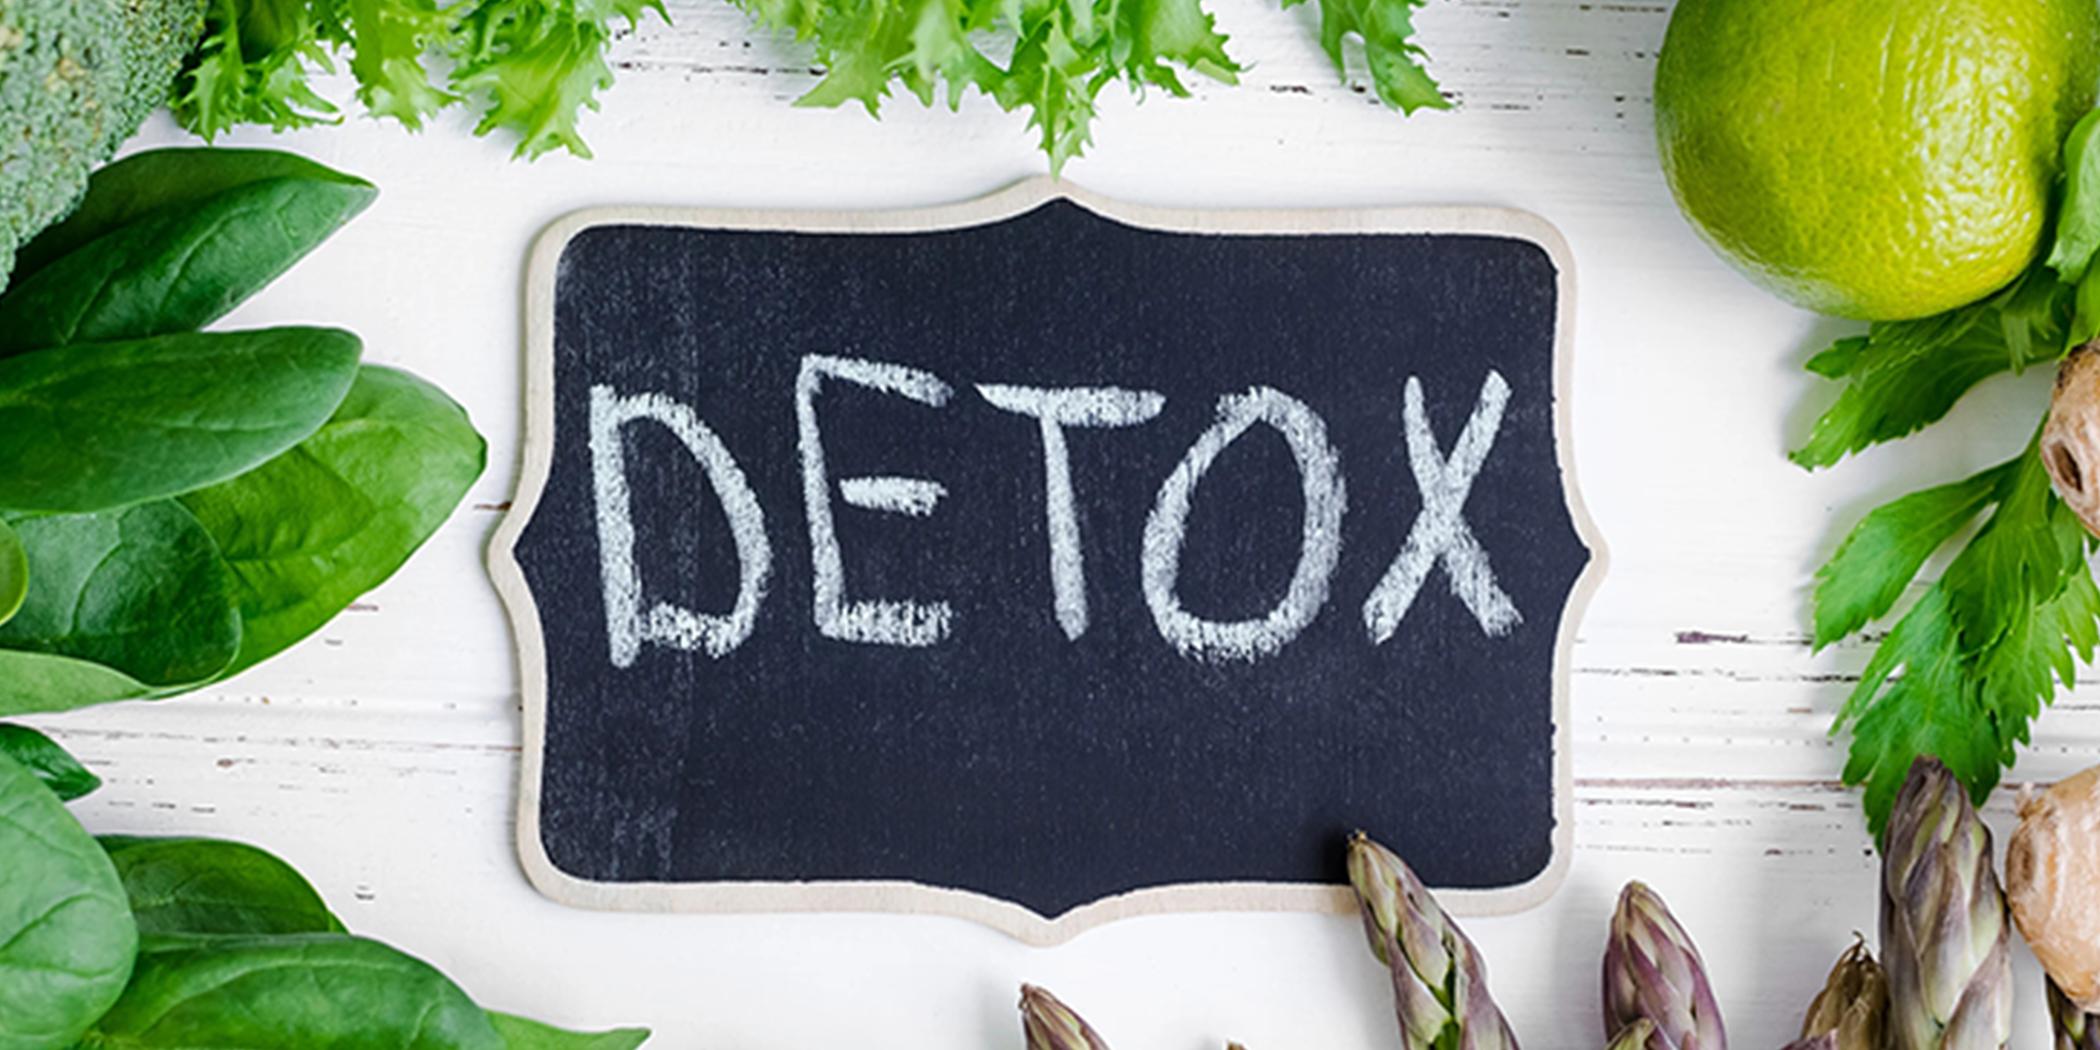 Daily Detox For Brain Health